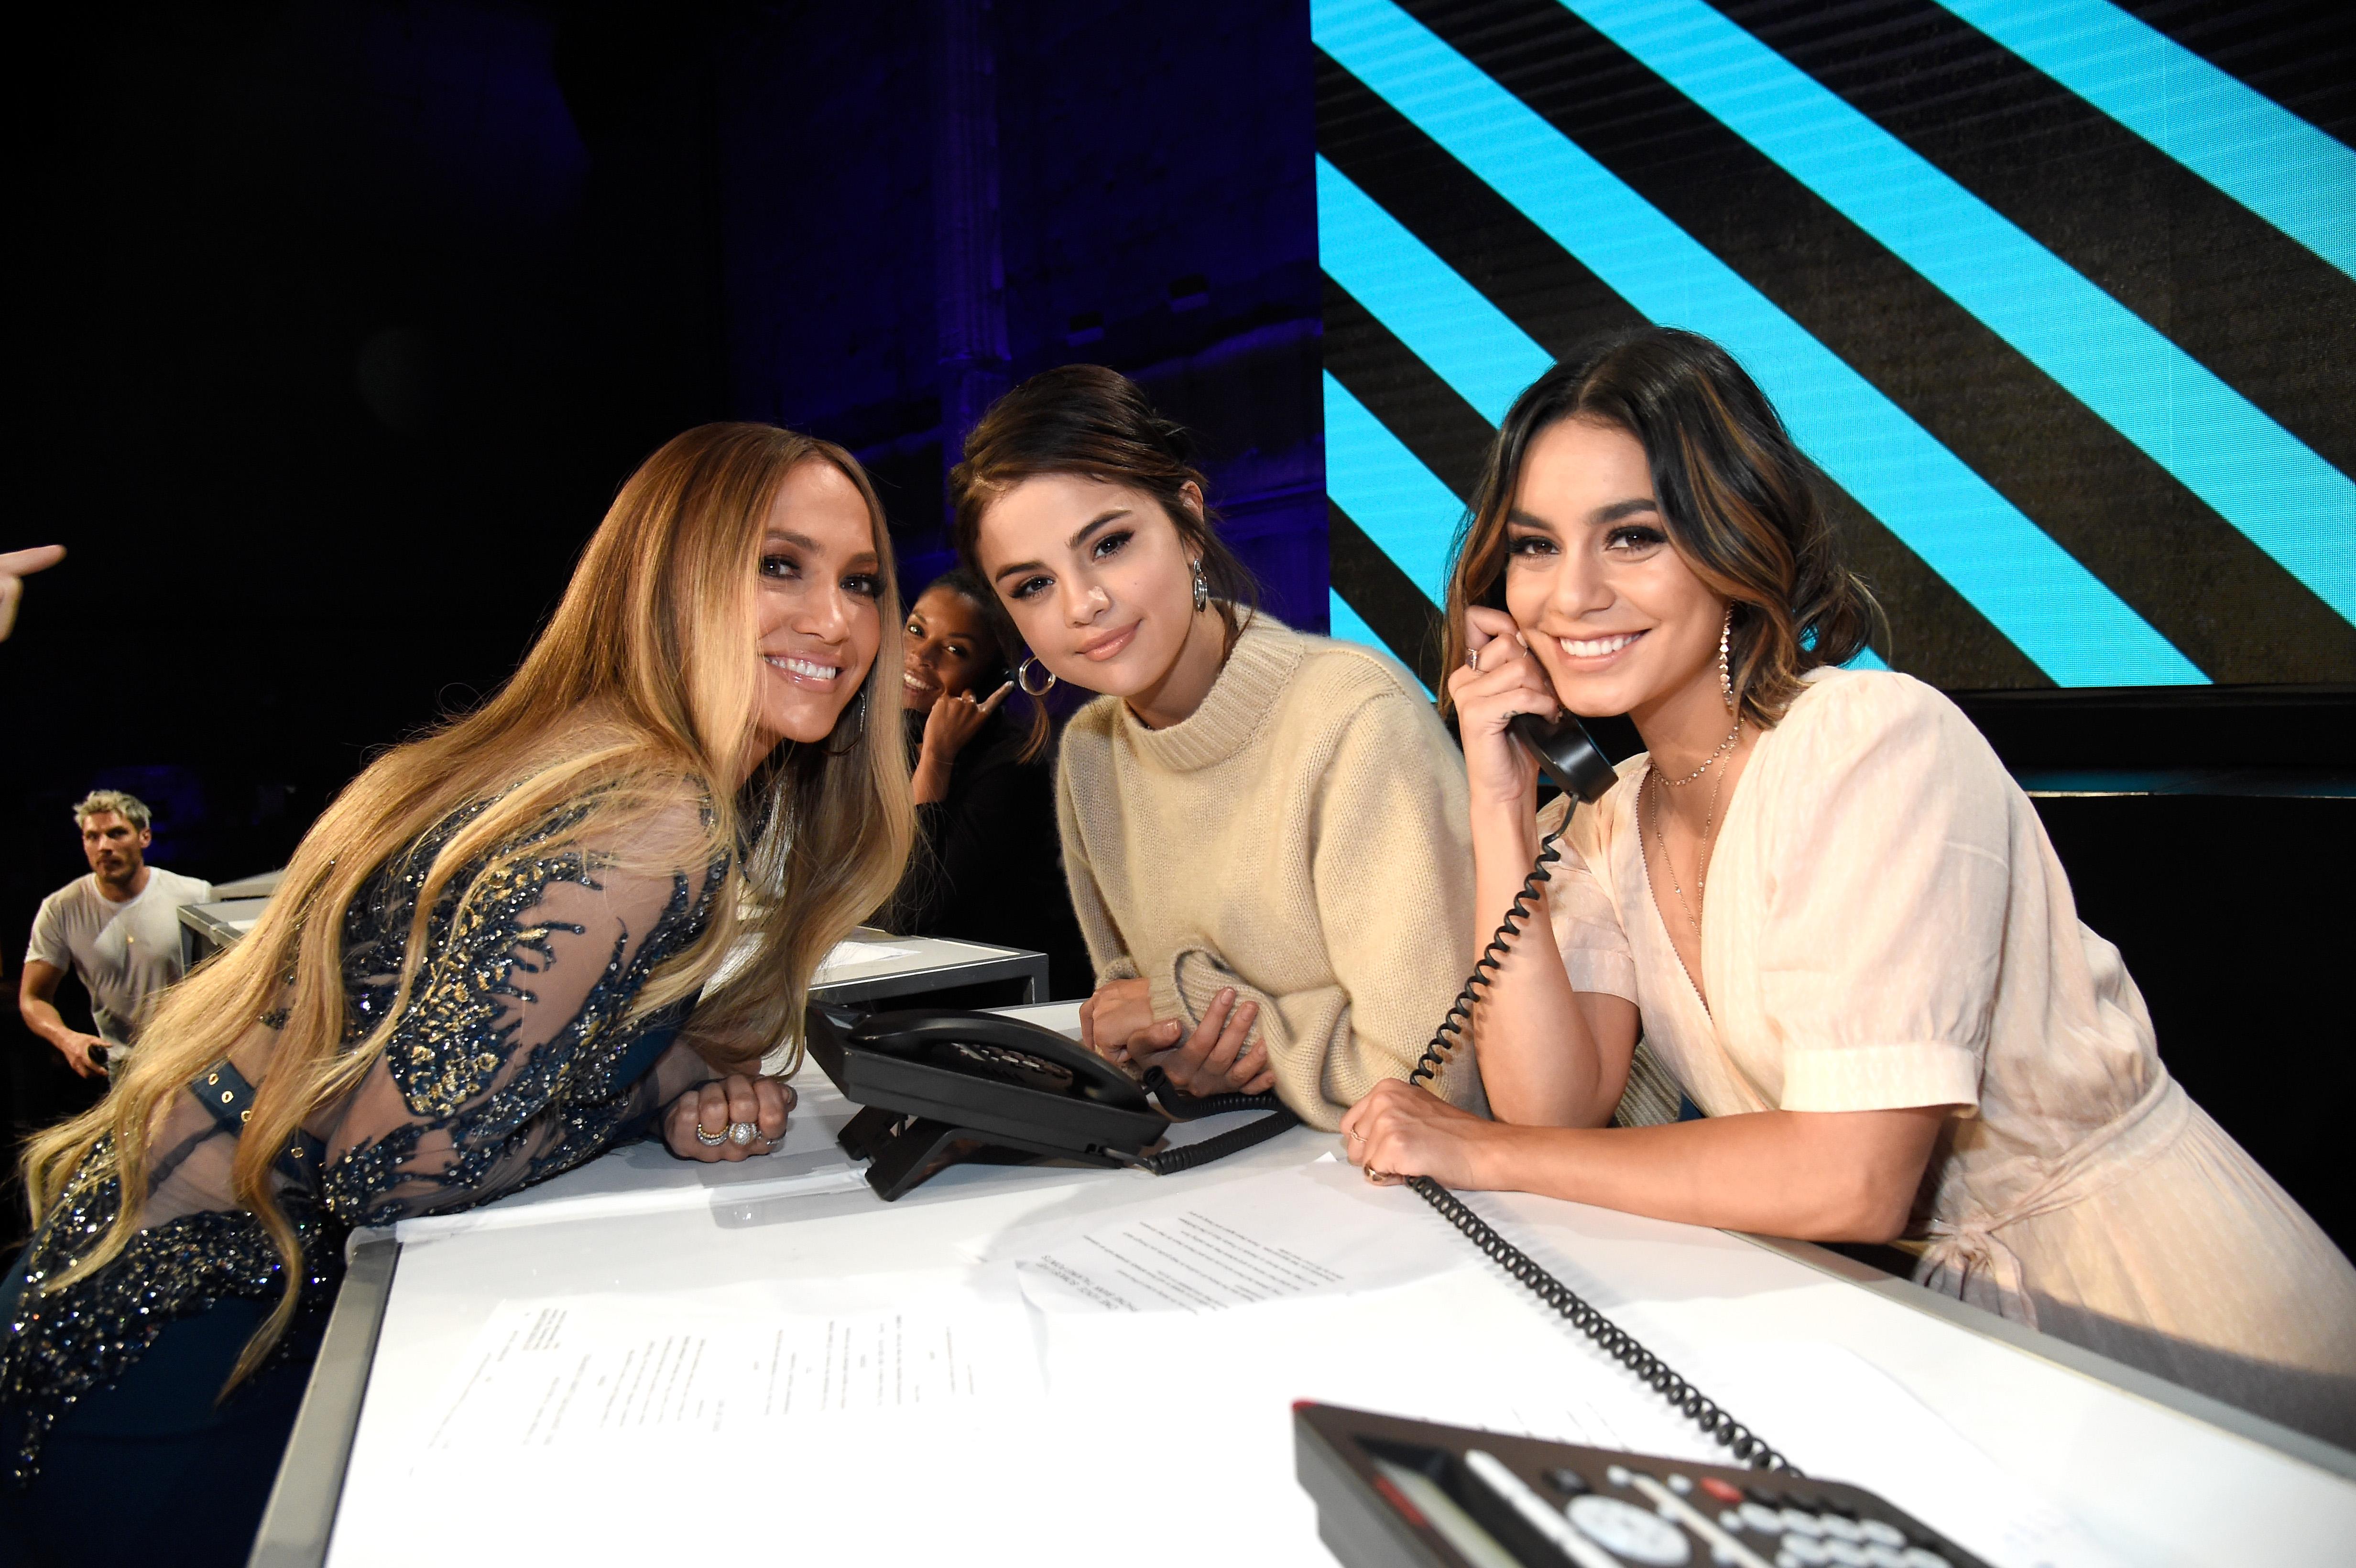 Jennifer Lopez, Selena Gomez, actor Vanessa Hudgens